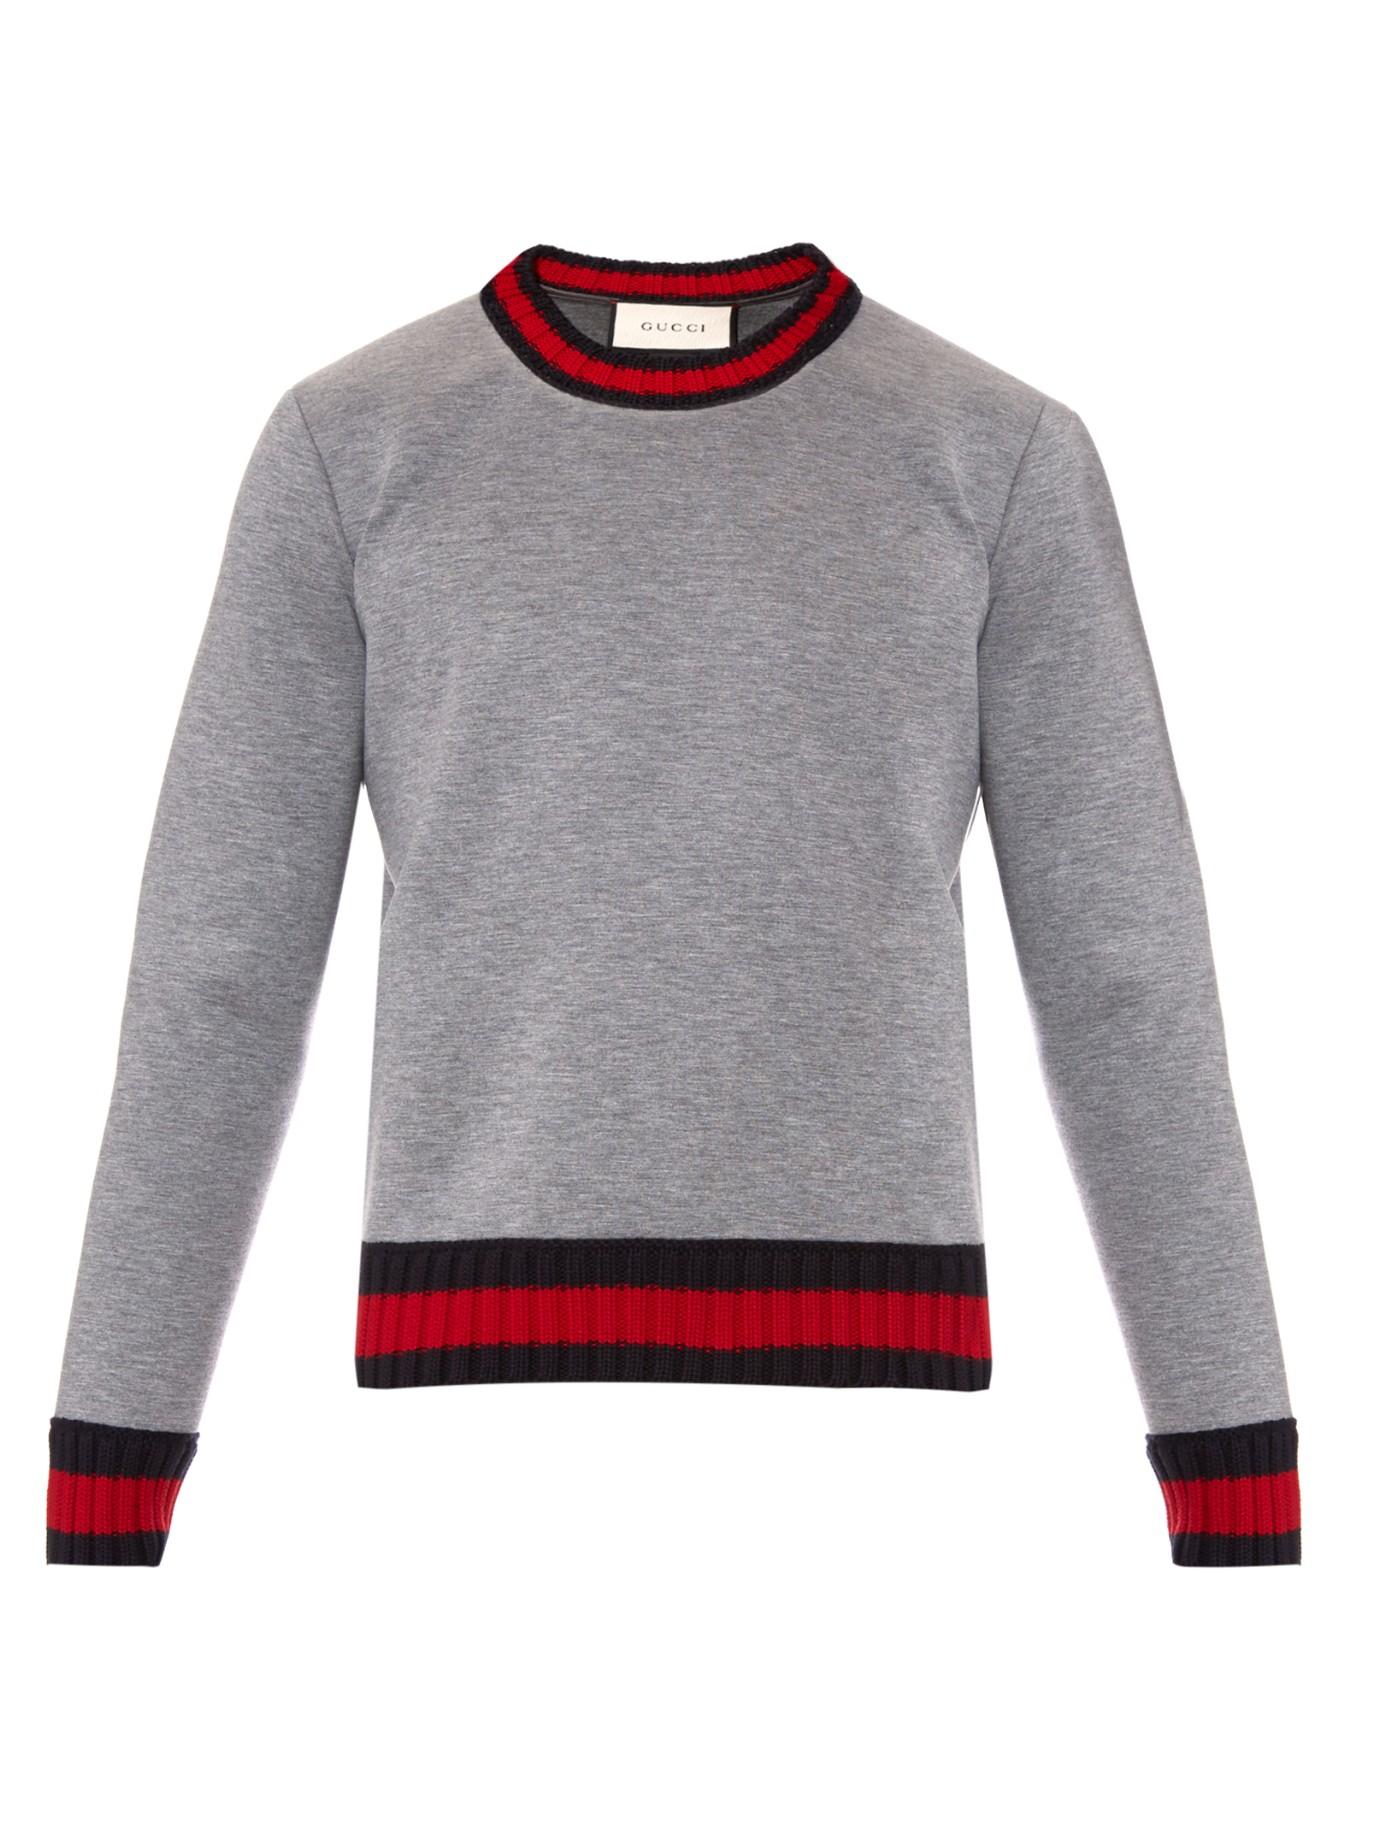 0f50f920c8a Lyst - Gucci Crew-neck Neoprene Sweatshirt in Gray for Men